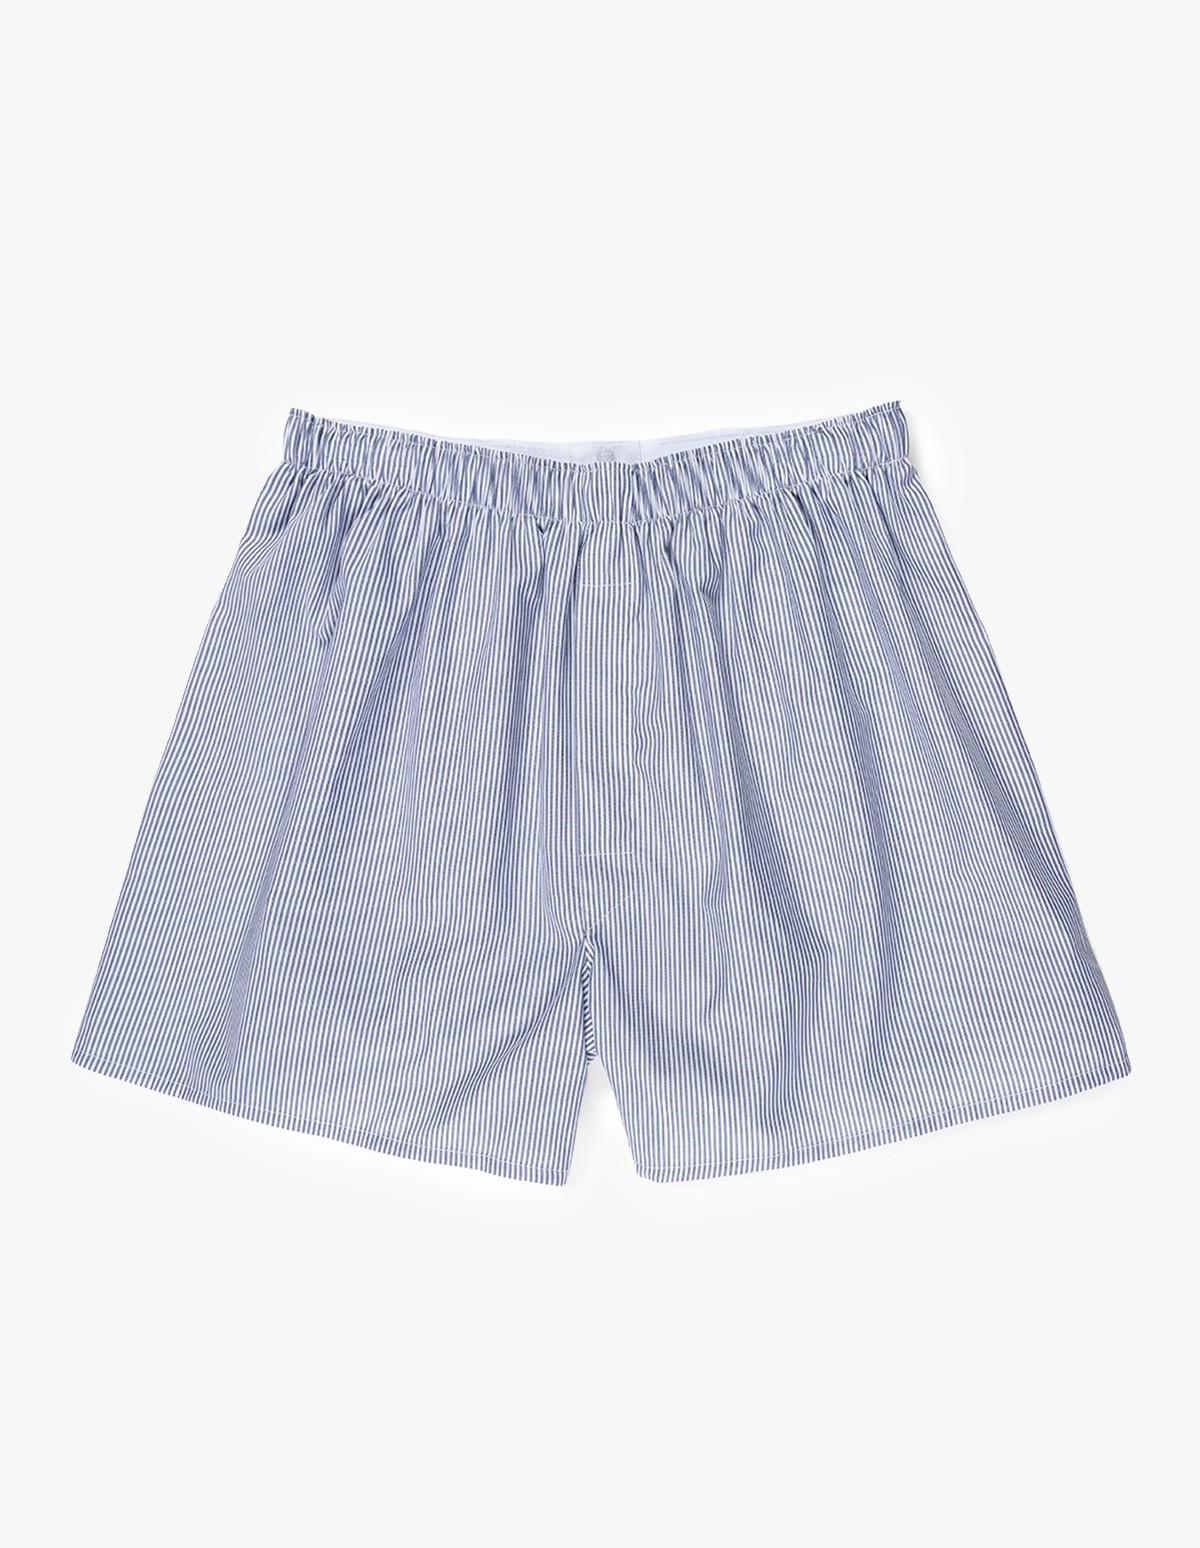 Sunspel Classic Boxer Short  in Light Blue - Pinstripe